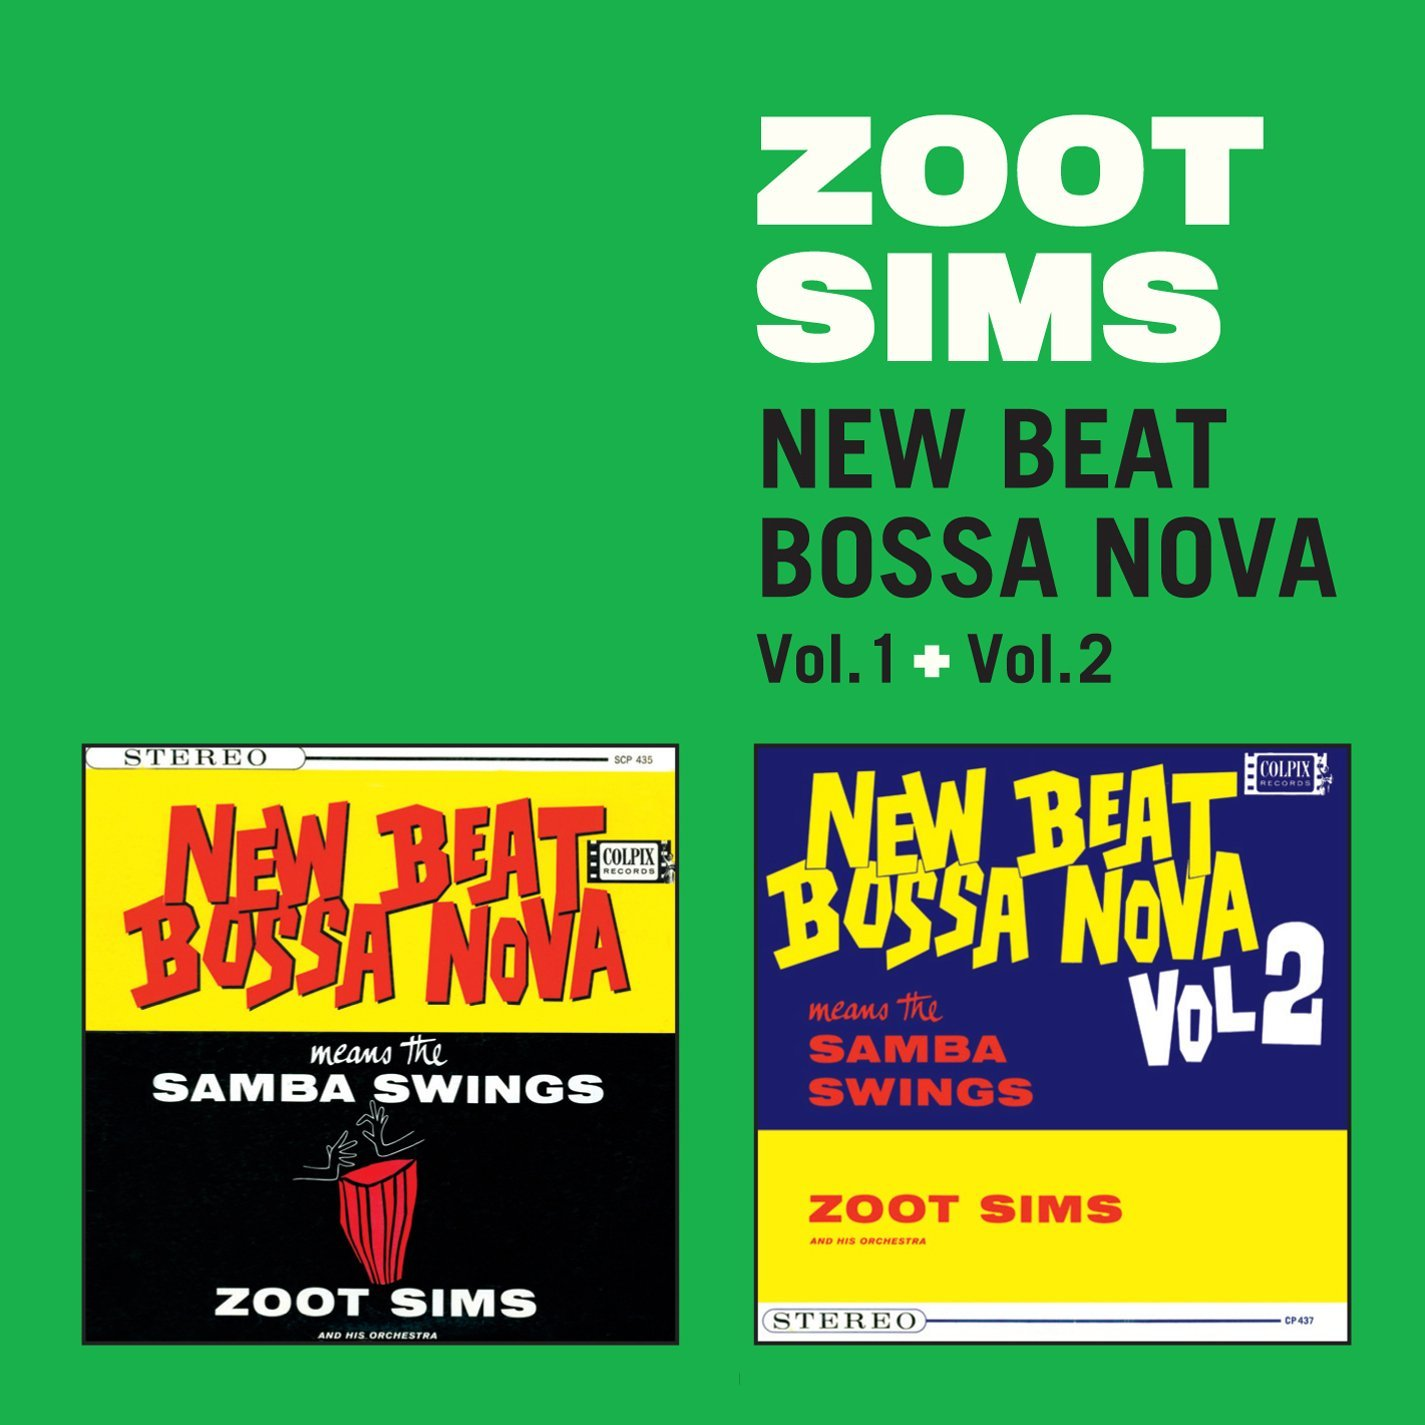 ZOOT SIMS - NEW BEAT BOSSA NOVA VOL 1 & 2 (CD)